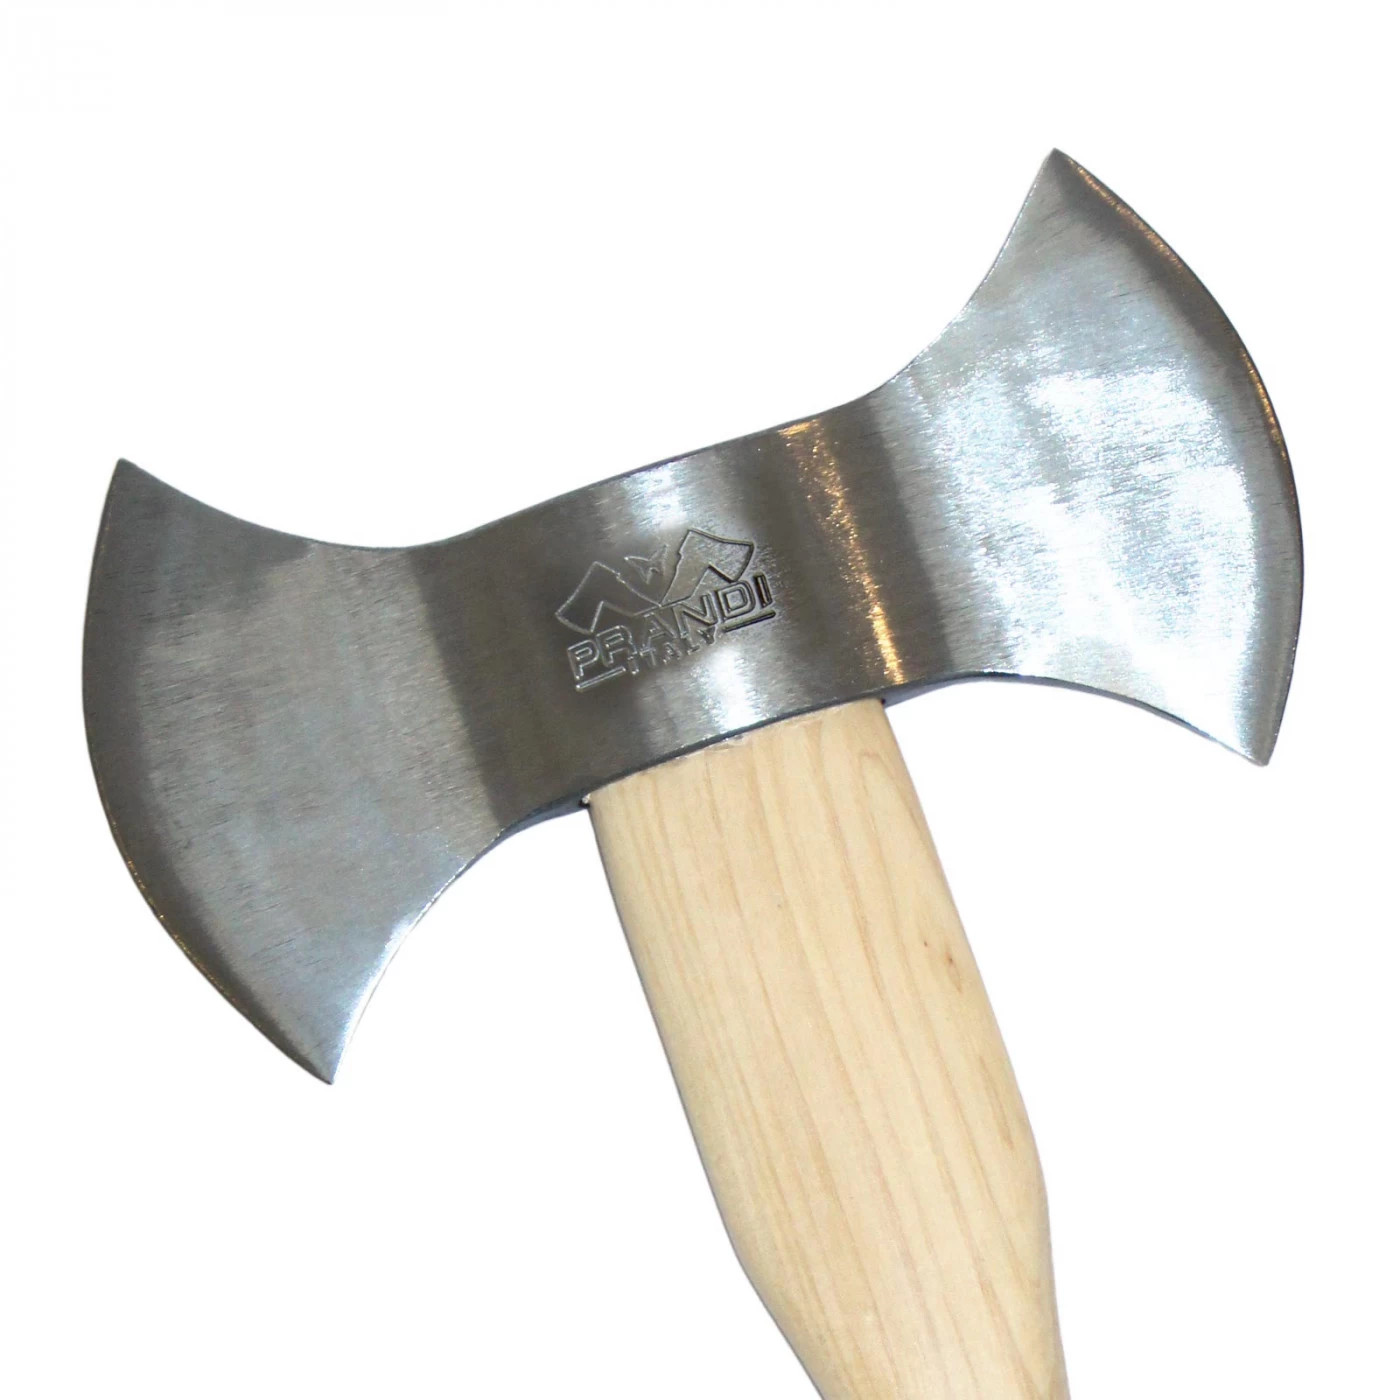 Prandi Doppelschneidige Wurfaxt 1200 gr